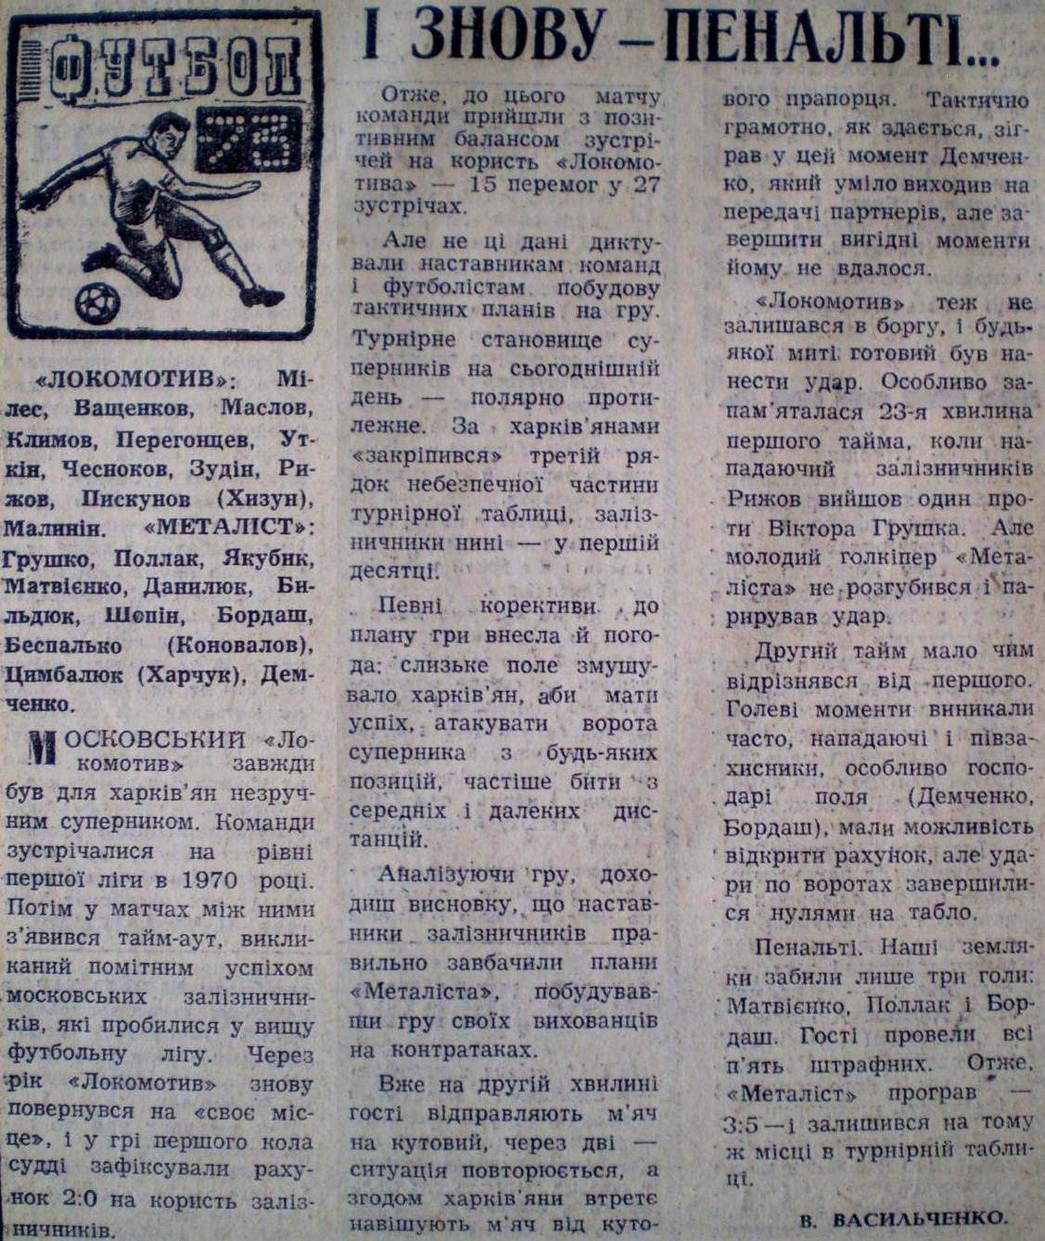 [Изображение: 1973-08-12_MKh-LM_0-0.jpg]